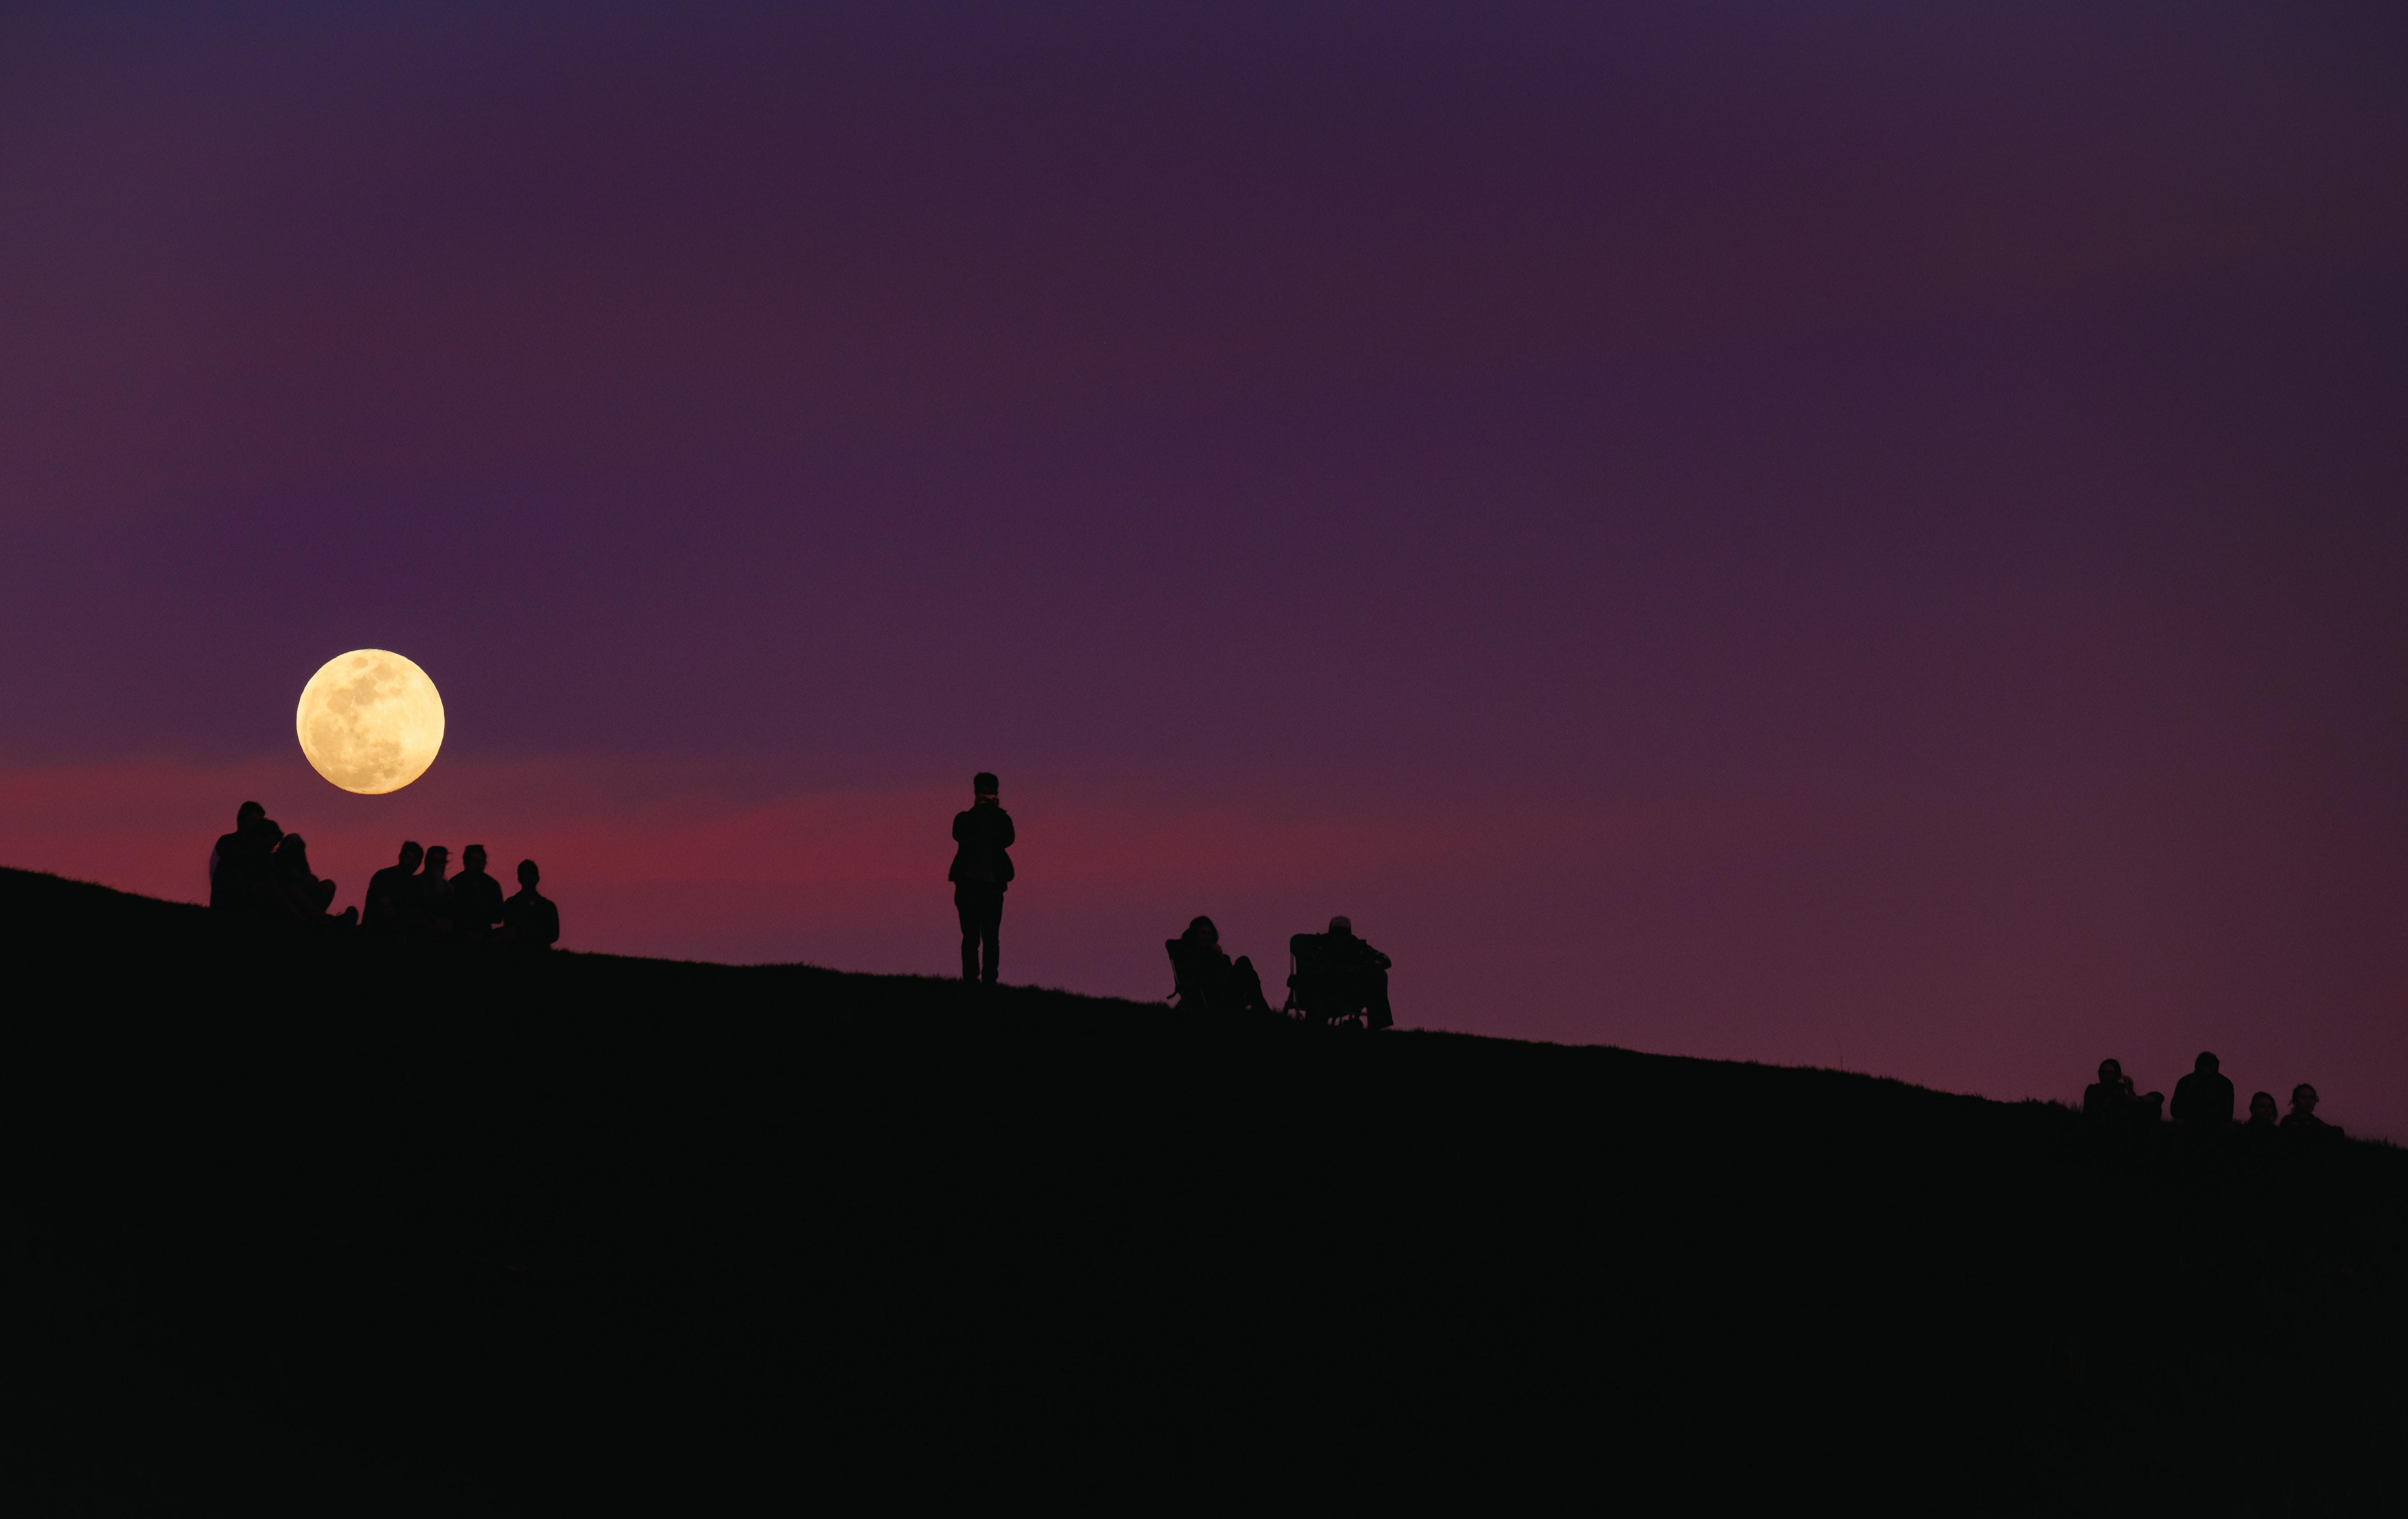 silhouette of group of people under purple night sky